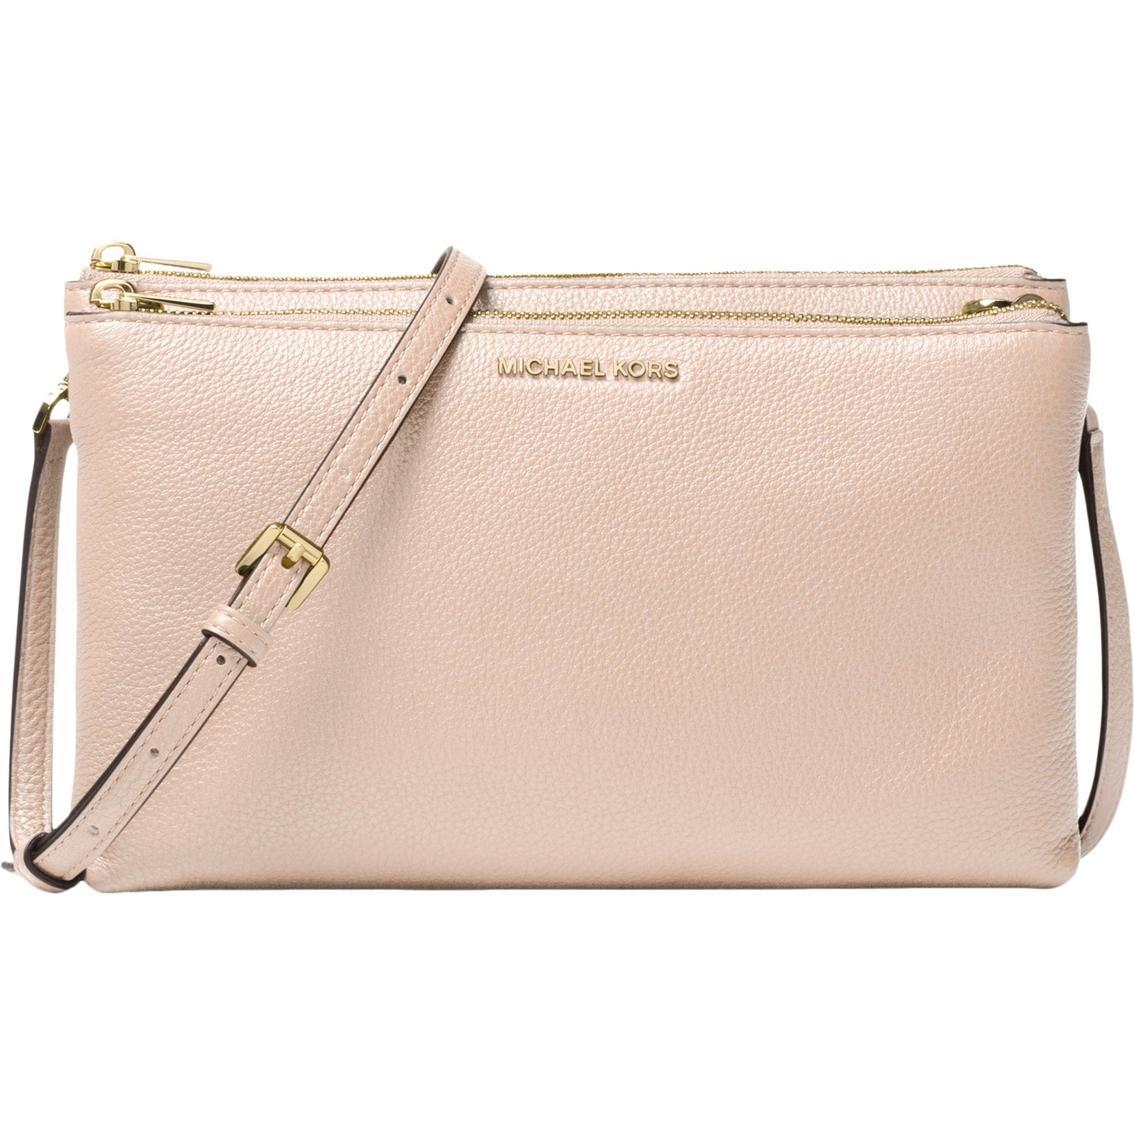 Michael Kors Adele Double Zip Crossbody Handbag  26d8eb79cb631